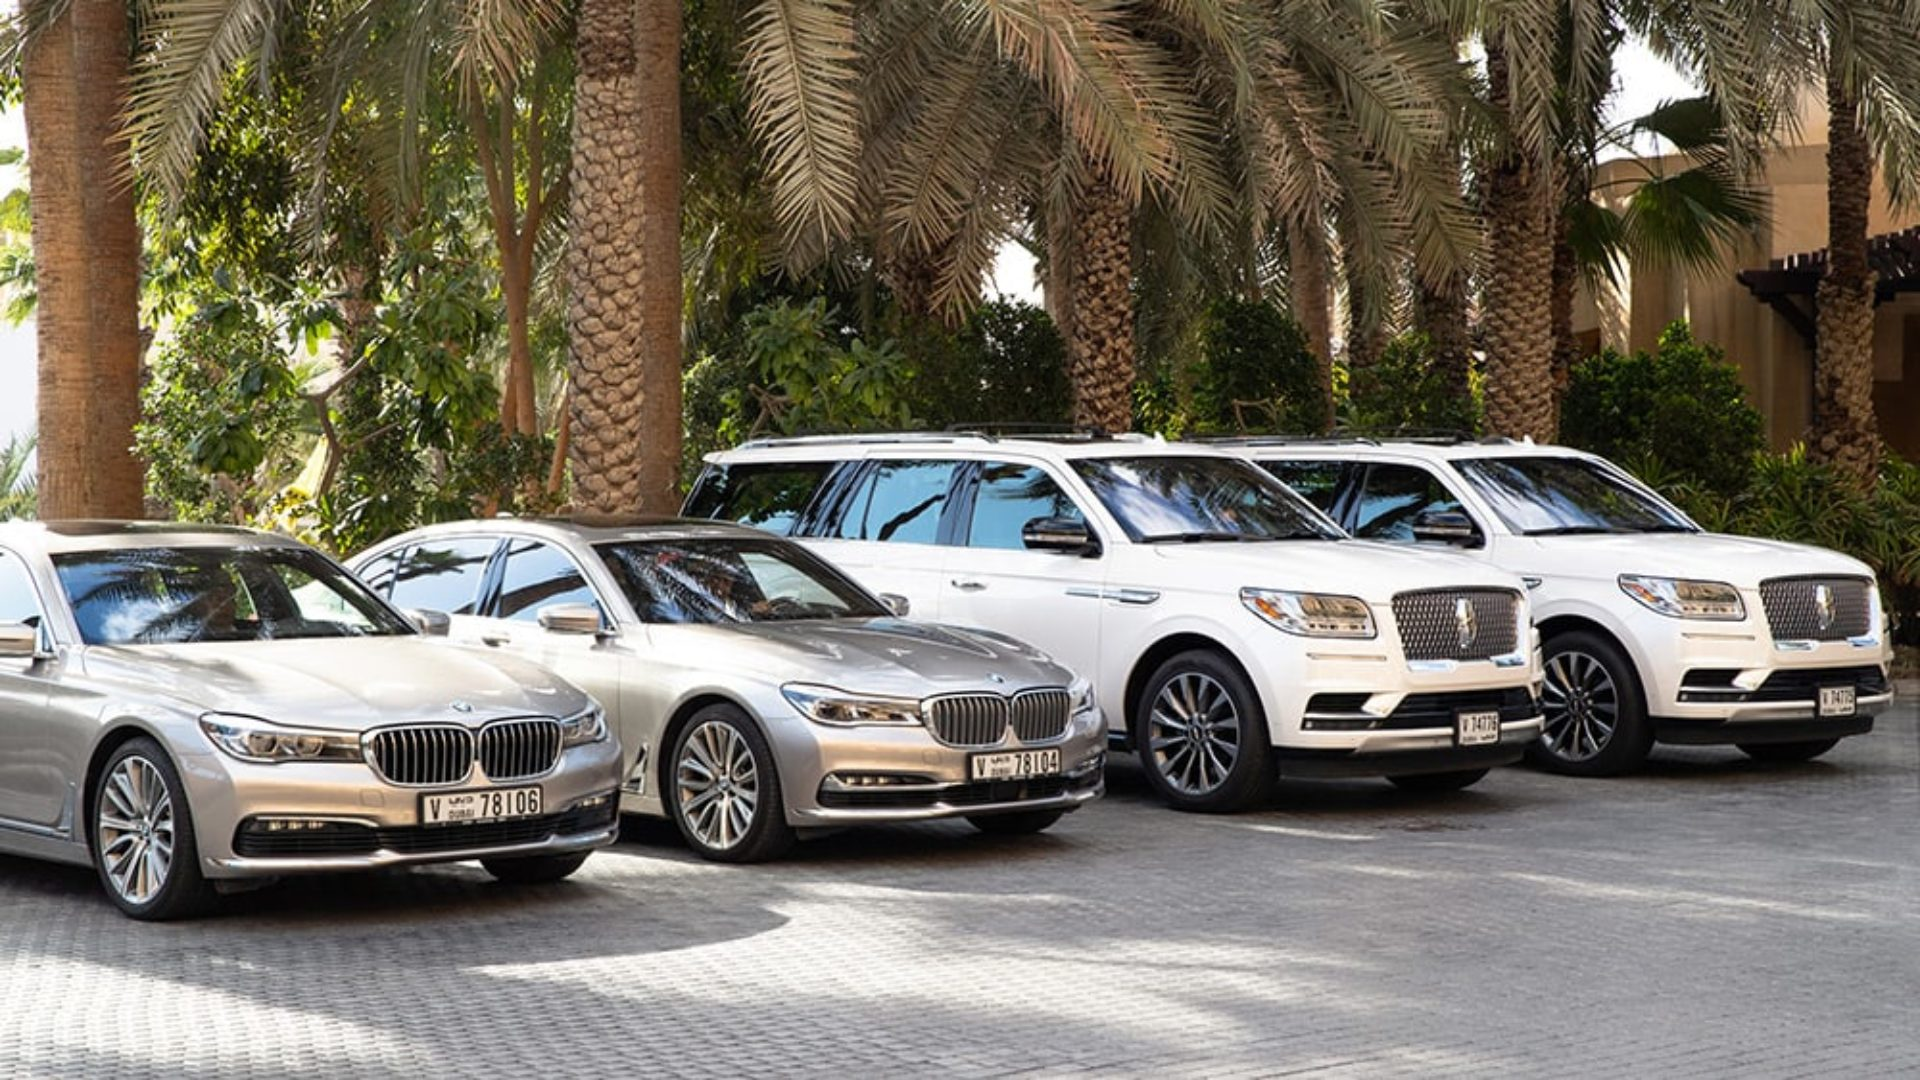 Luxury vehicle fleet at Jumeirah Mina A'Salam